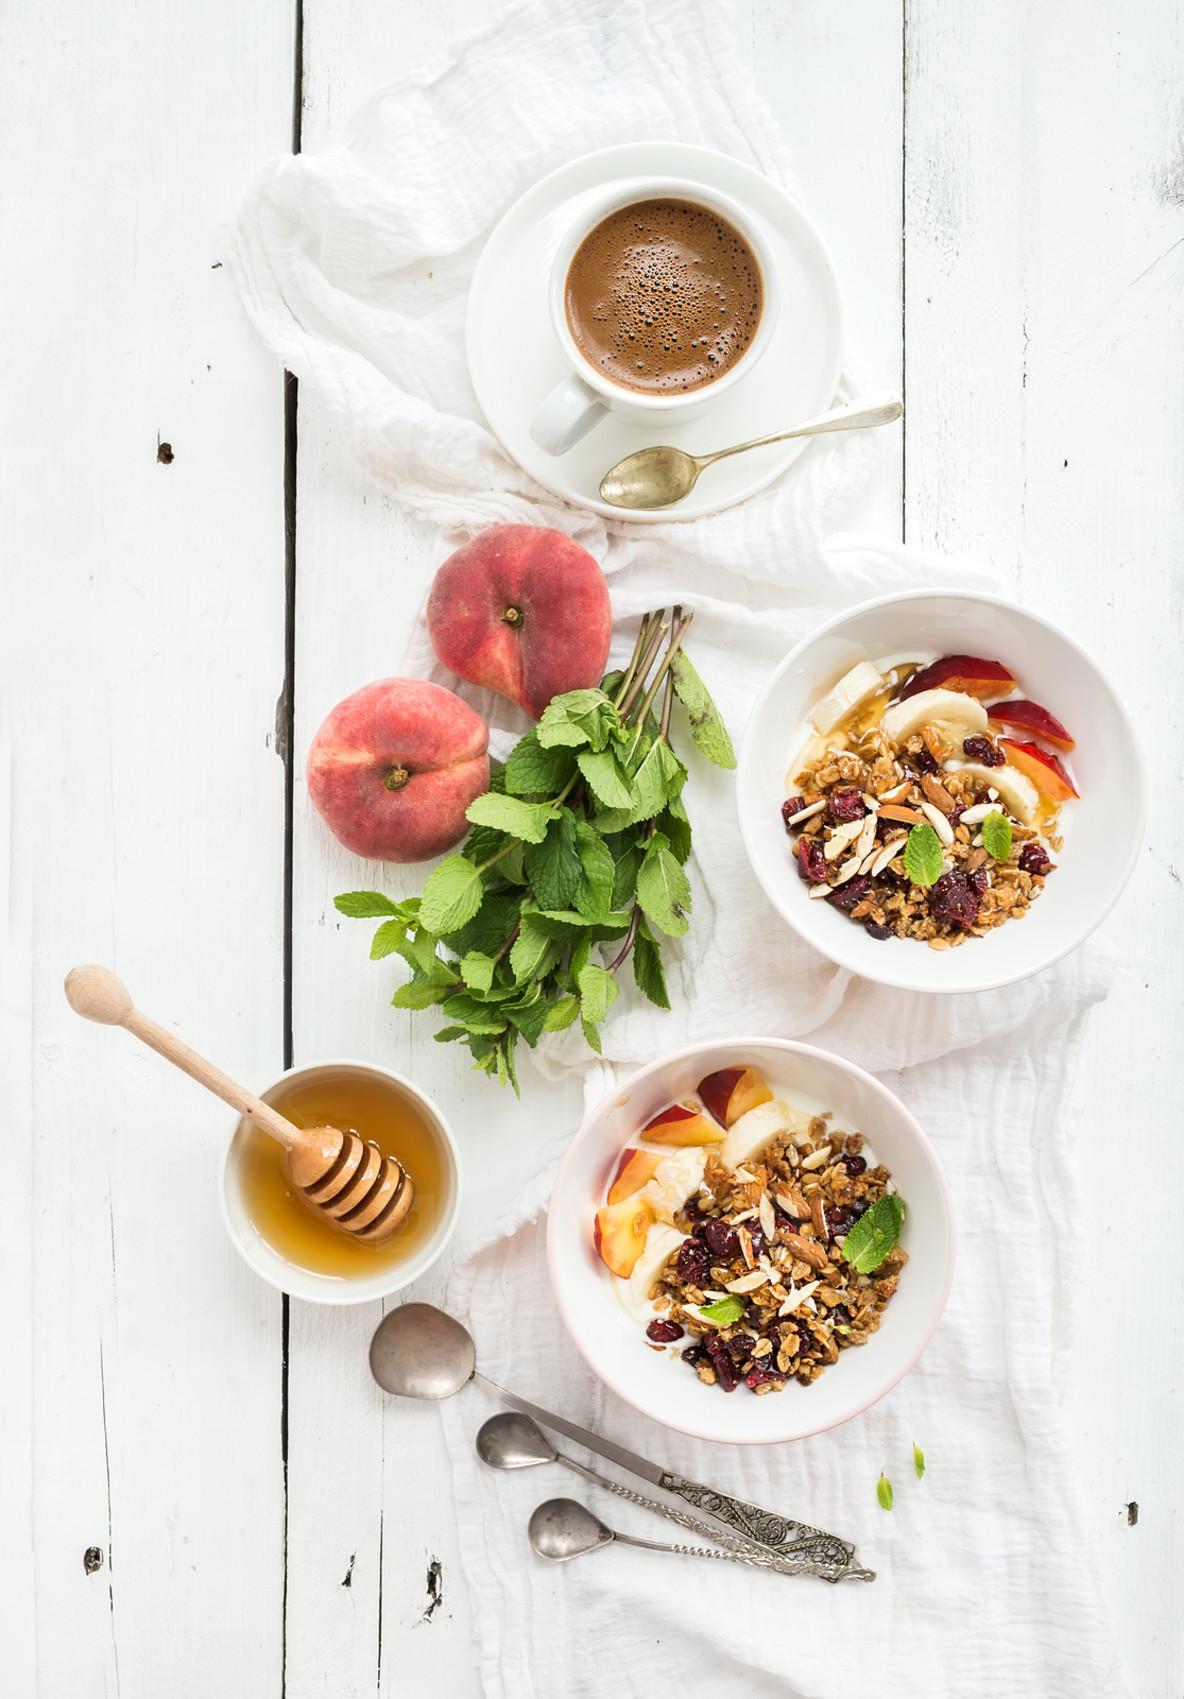 Healthy breakfast  Bowl of oat granola with yogurt  fresh fruit  mint and honey  Coffee  vintage silverware  Top view